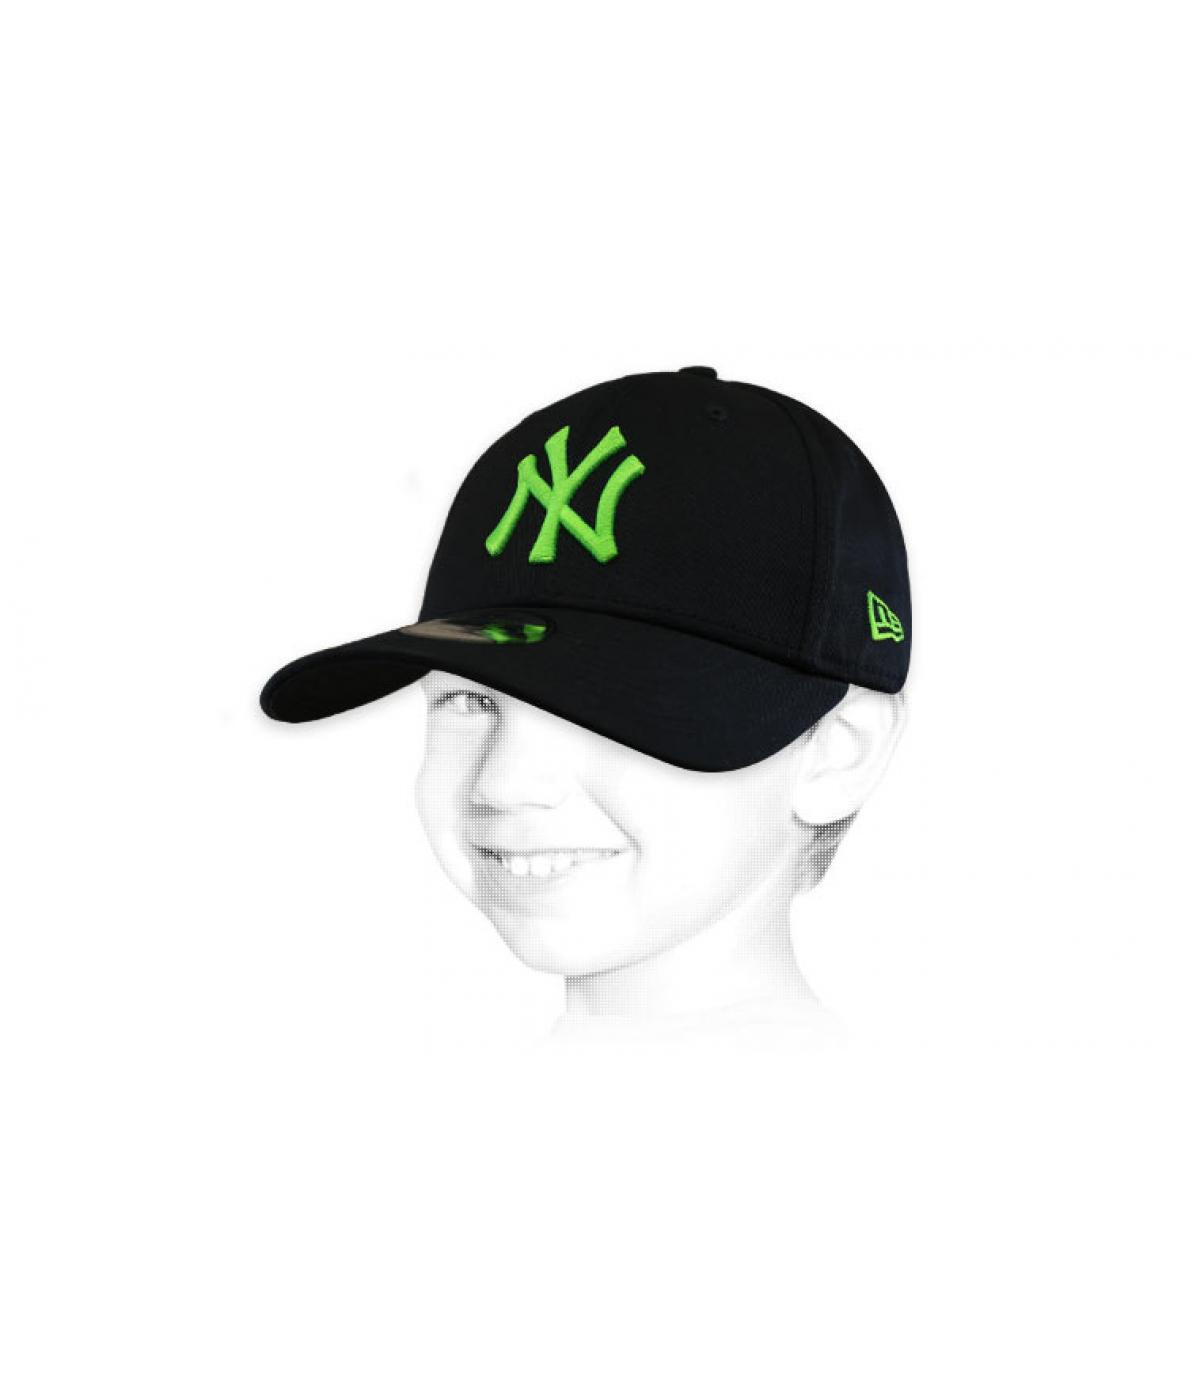 NY pet kids zwart groen